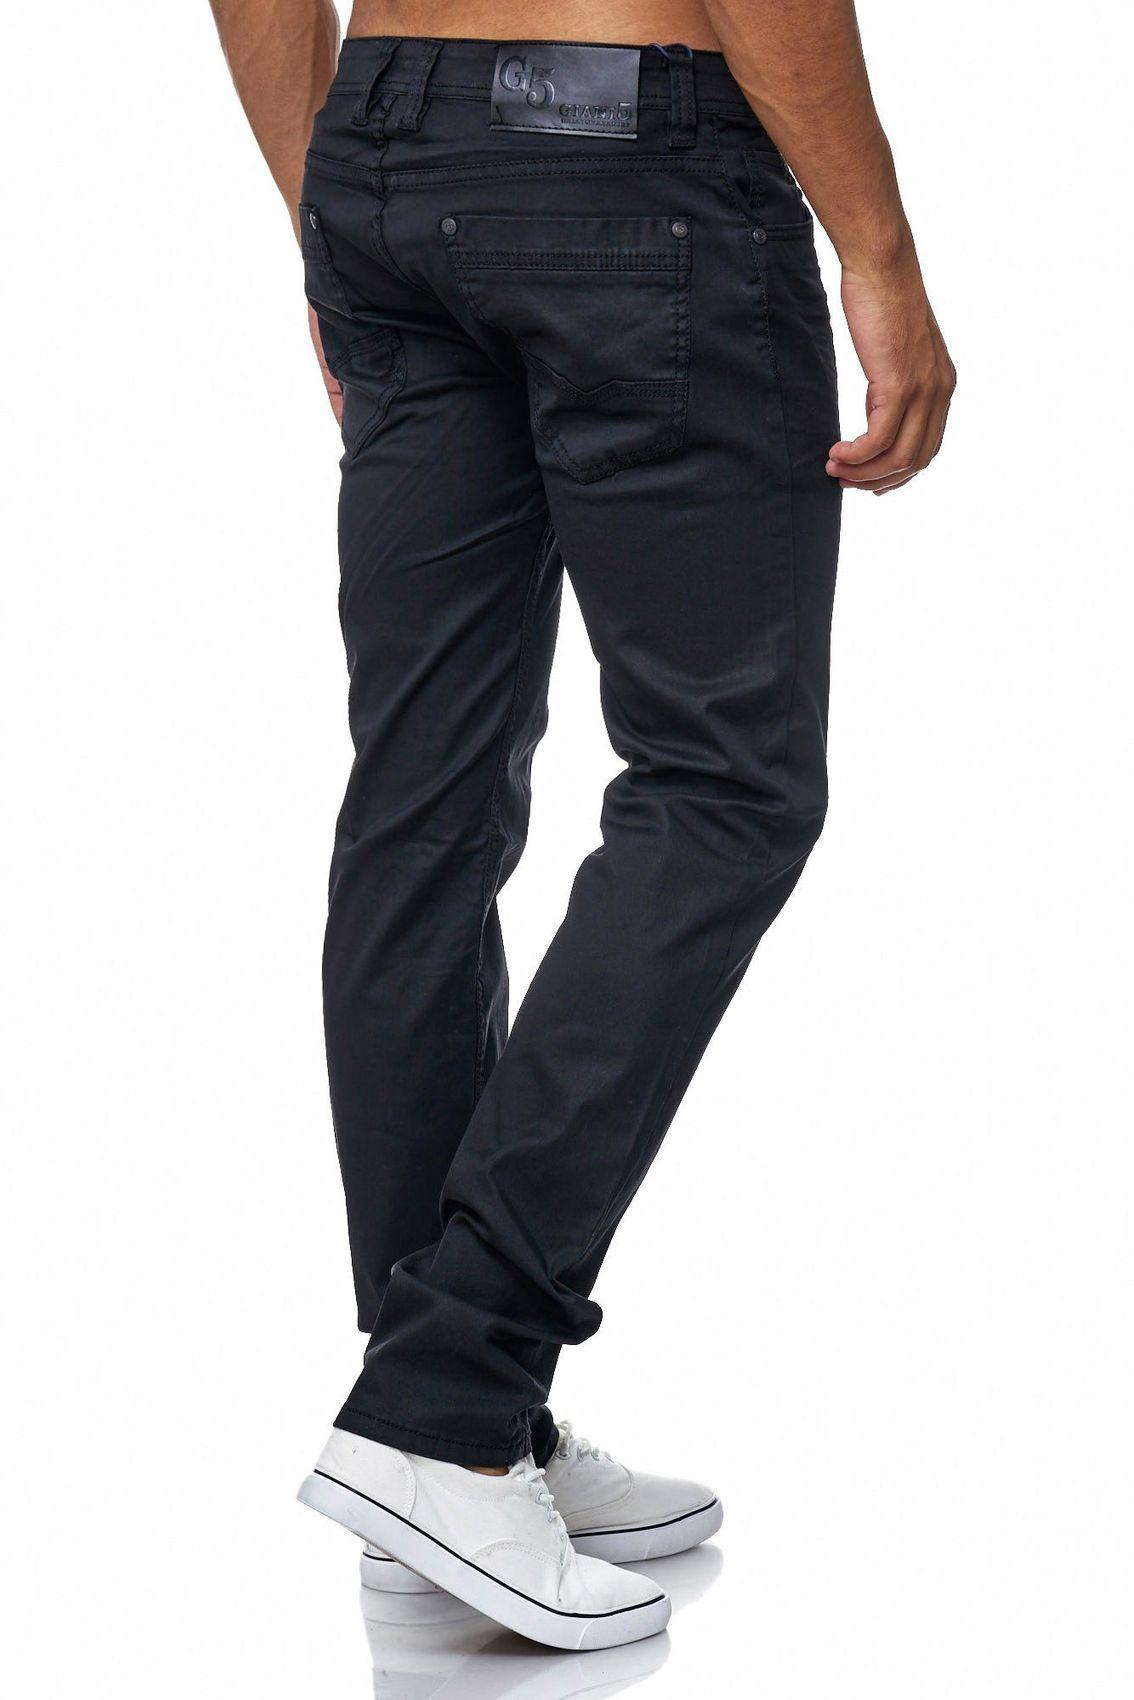 herren hose schwarz beschichtet slim fit coated jeans club all black edel wow ebay. Black Bedroom Furniture Sets. Home Design Ideas